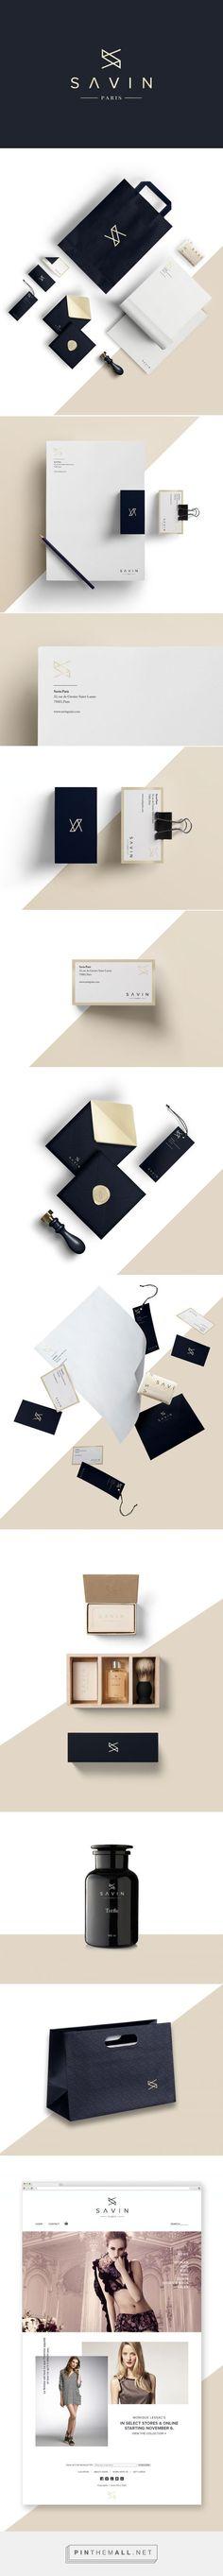 Savin Paris - fashion apparel on Behance - branding stationary corporate identity visual design label business card letterhead bag packaging website enveloppe logo minimalistic graphic design